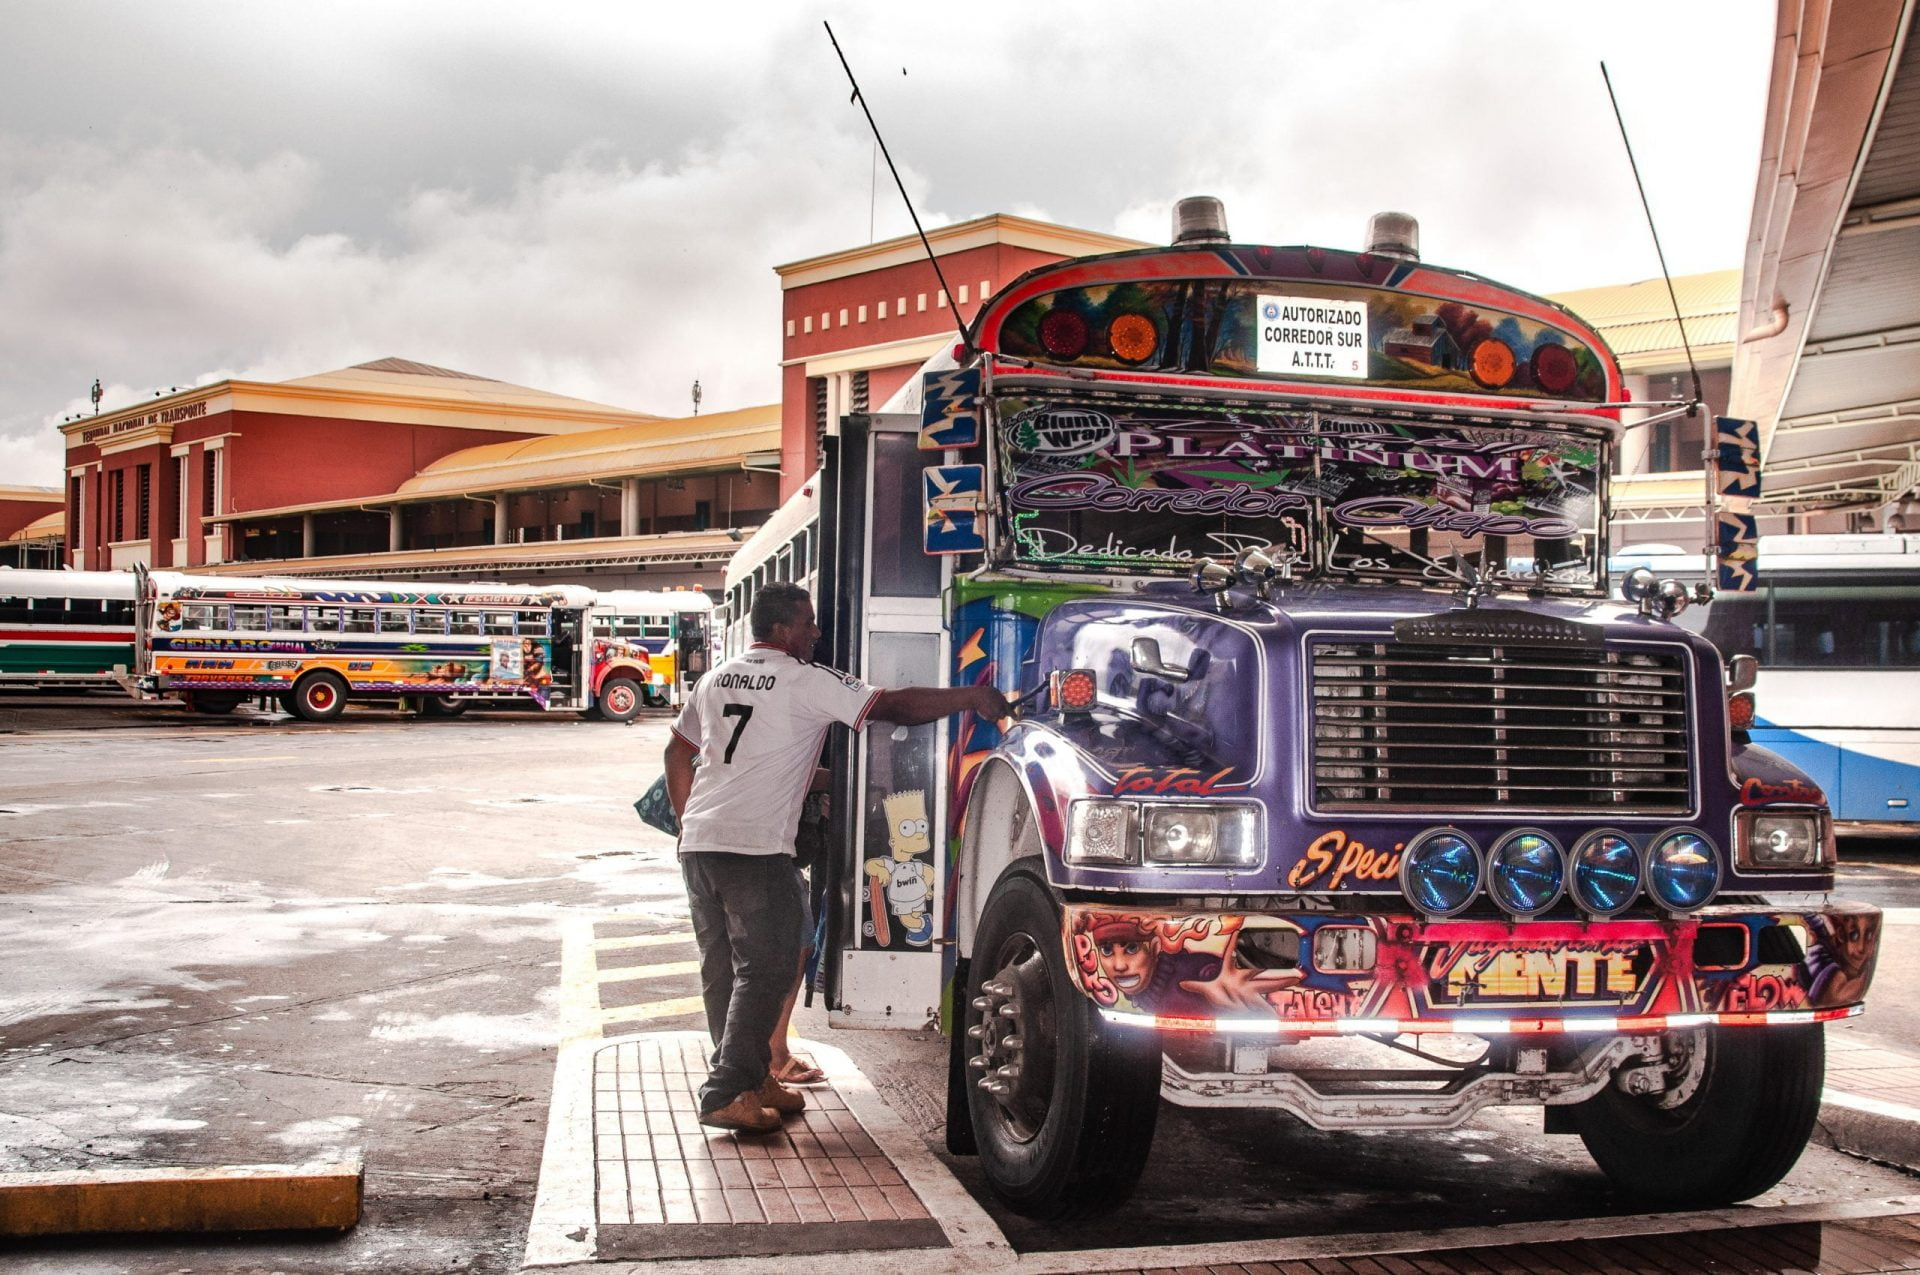 Panama city bus scaled - Les globe blogueurs - blog voyage nature